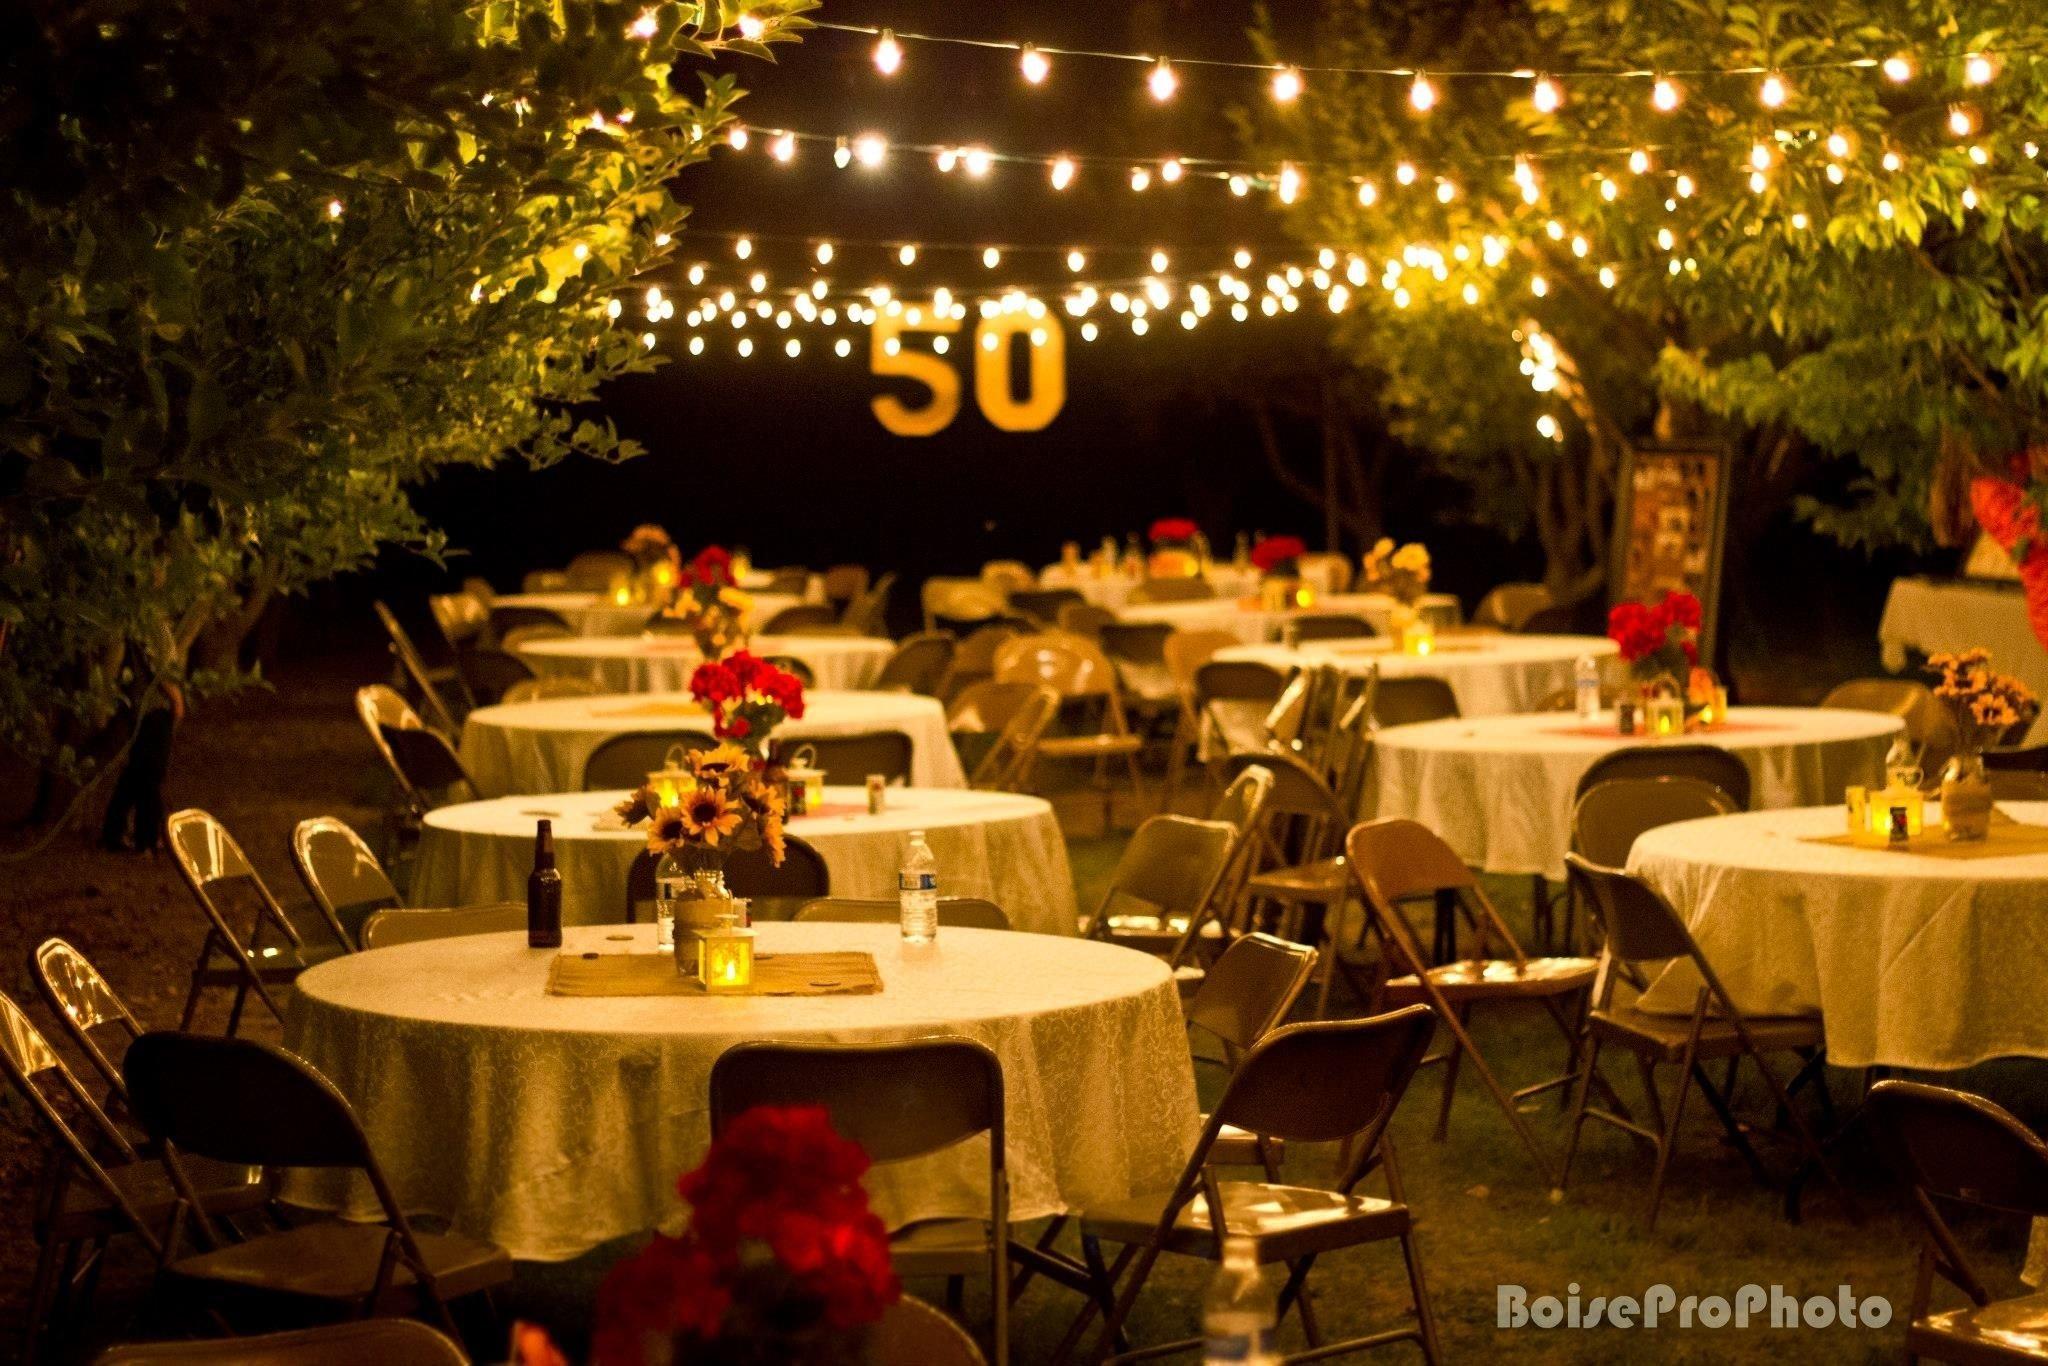 10 Stunning 50 Wedding Anniversary Party Ideas diy 50th wedding anniversary party from salty bison anniversary 1 2021